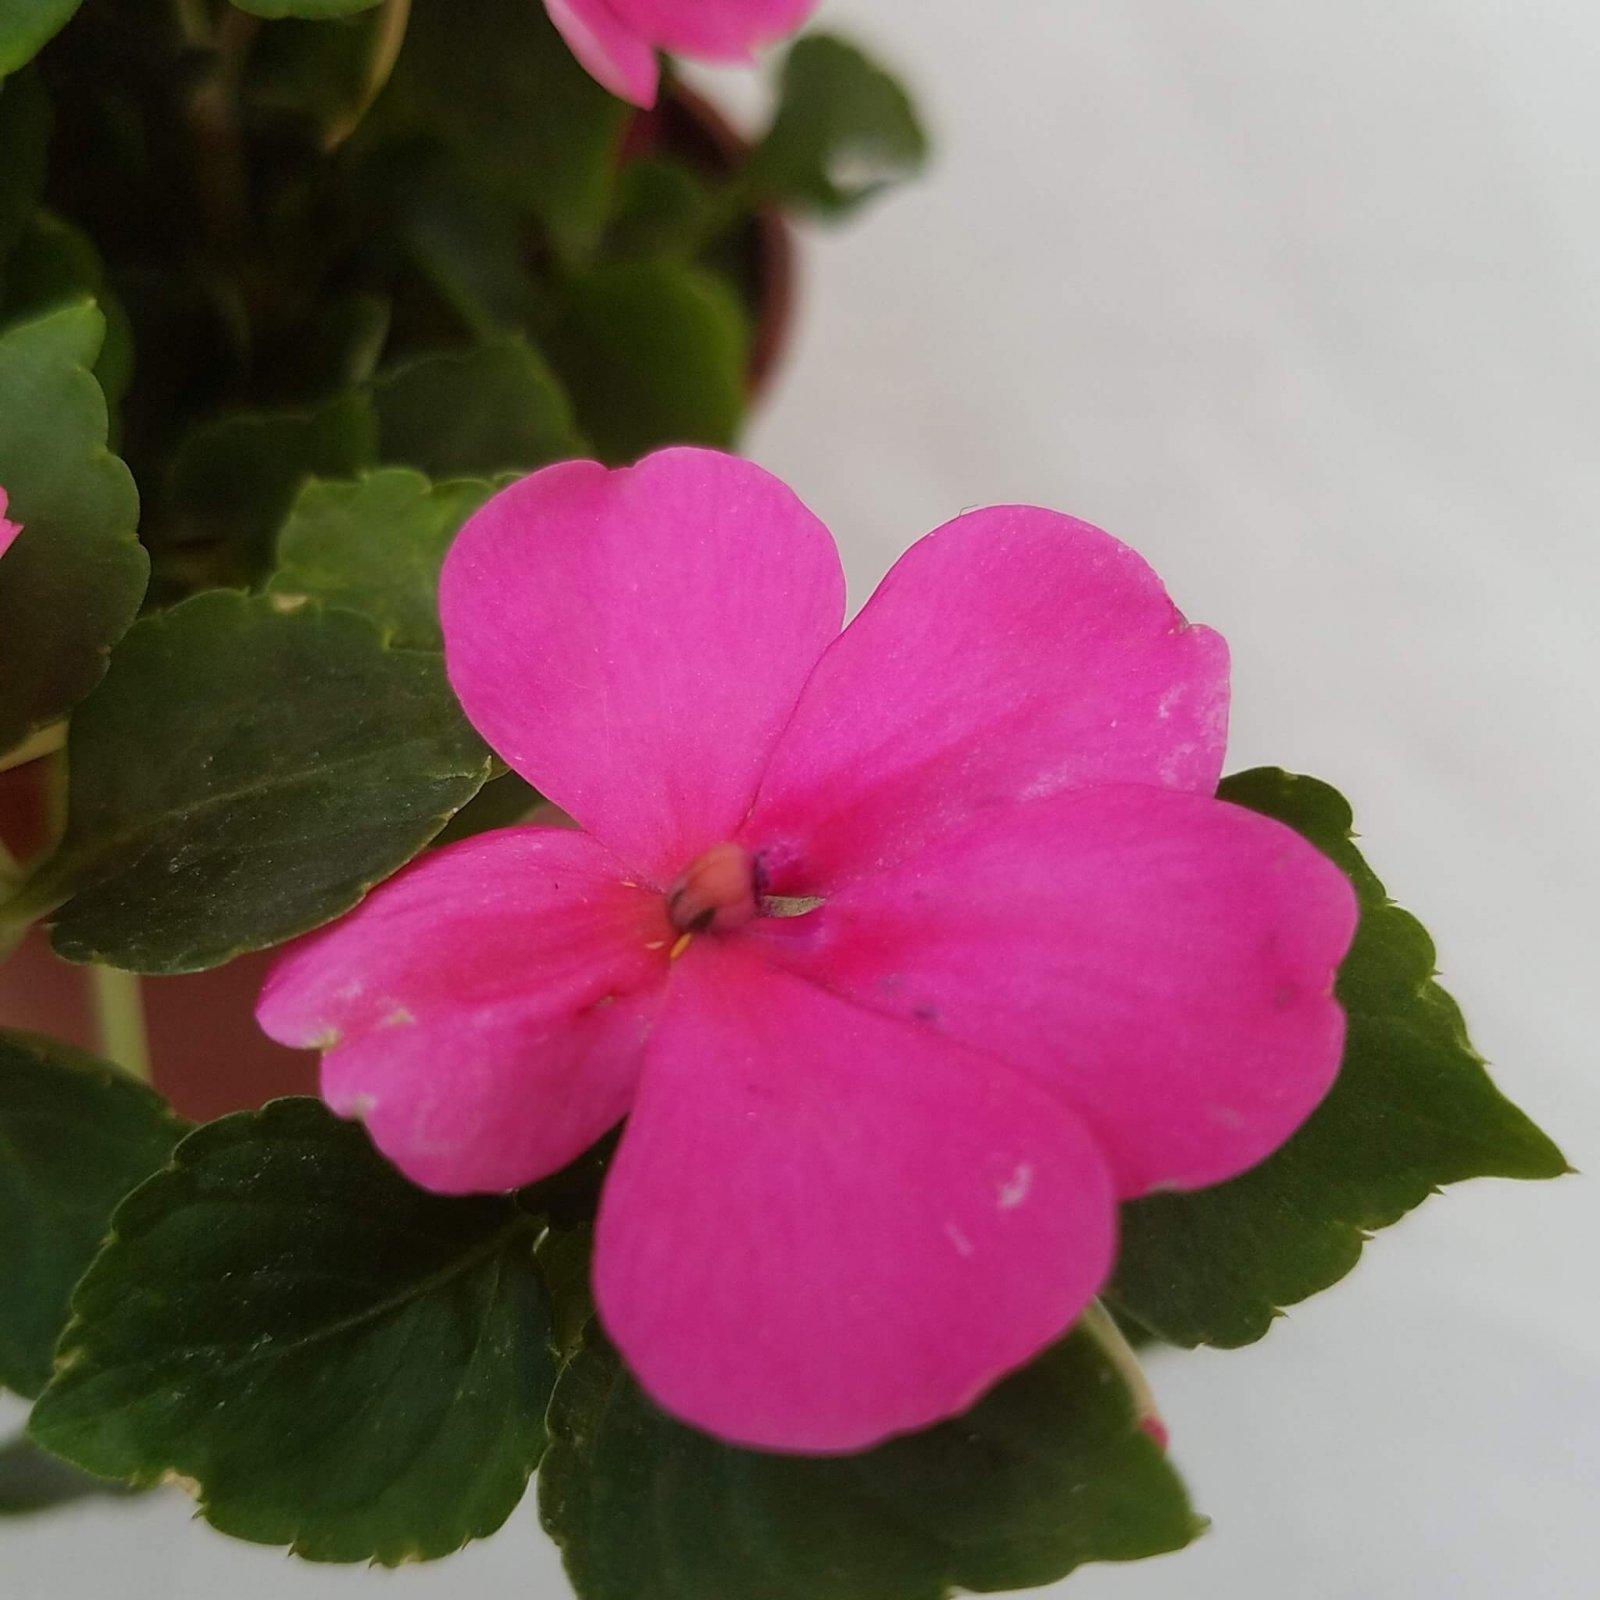 Impatiens 'S.E. Rose' - 4 1/2